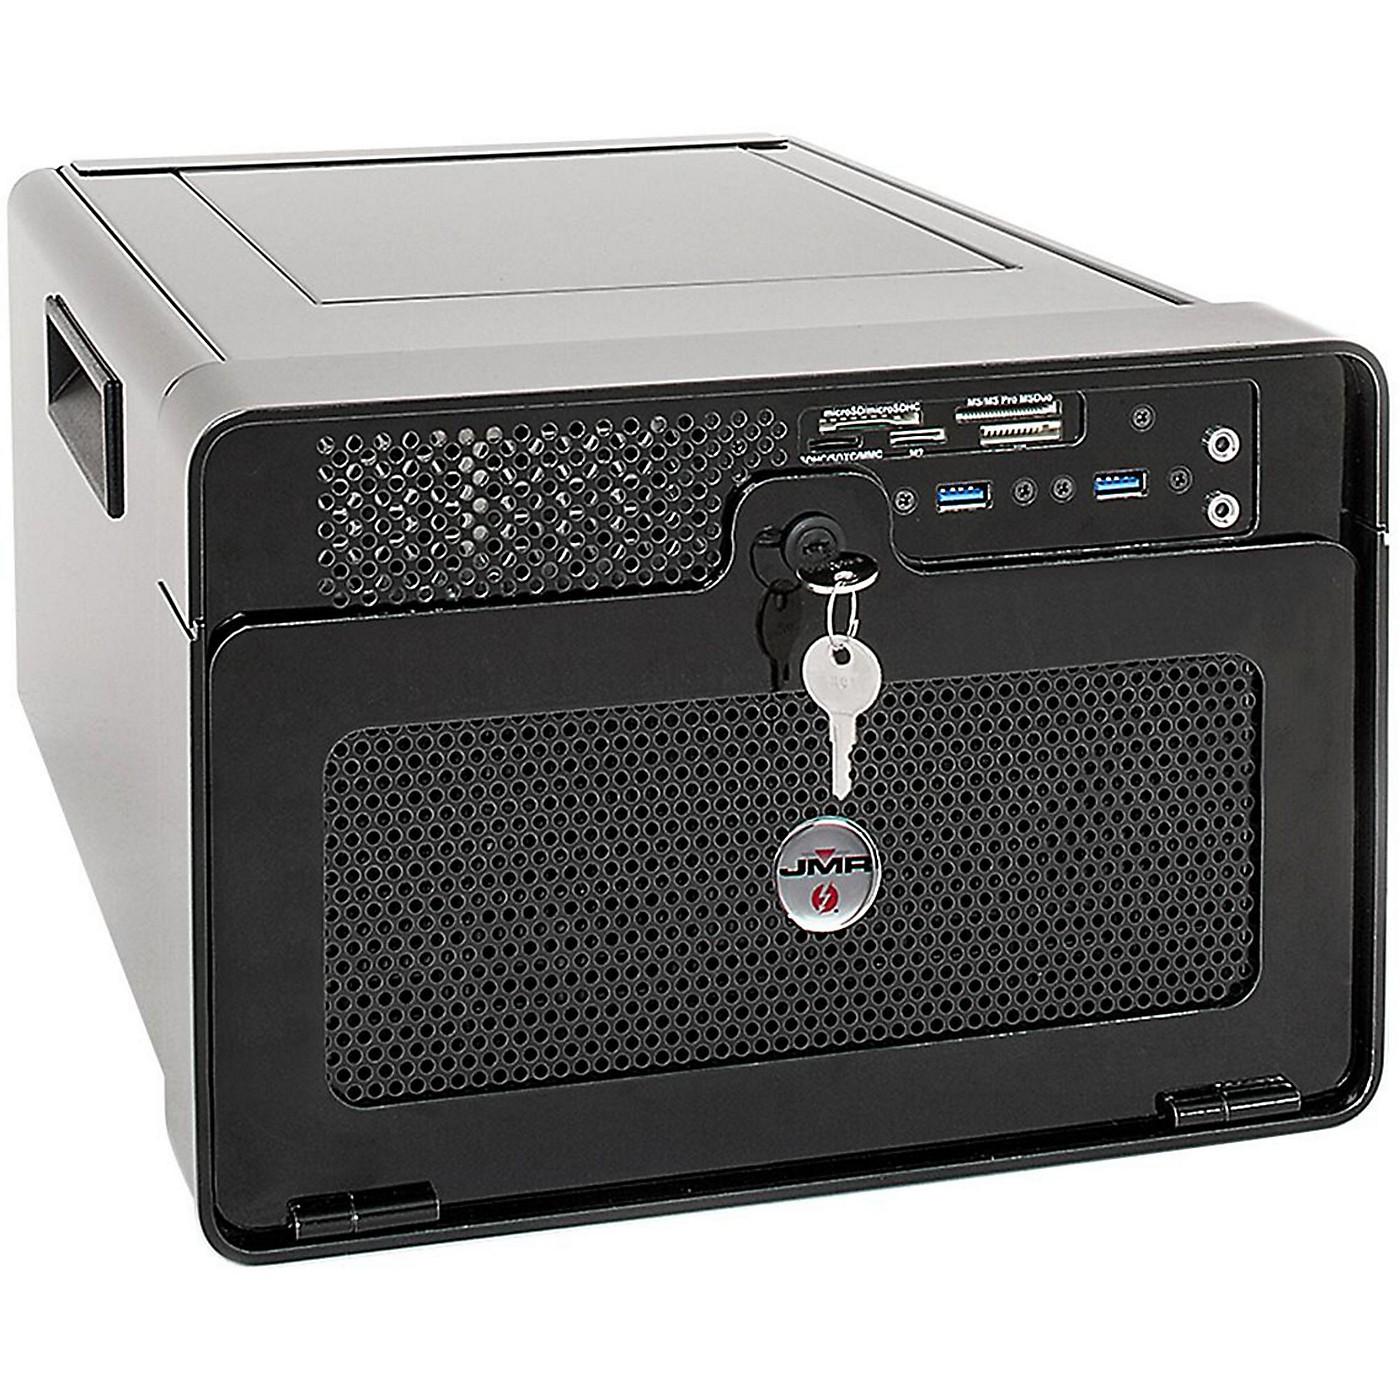 JMR Electronics LTNG-XD-8-MMDT Mac Mini Lightning Raid Storage System thumbnail